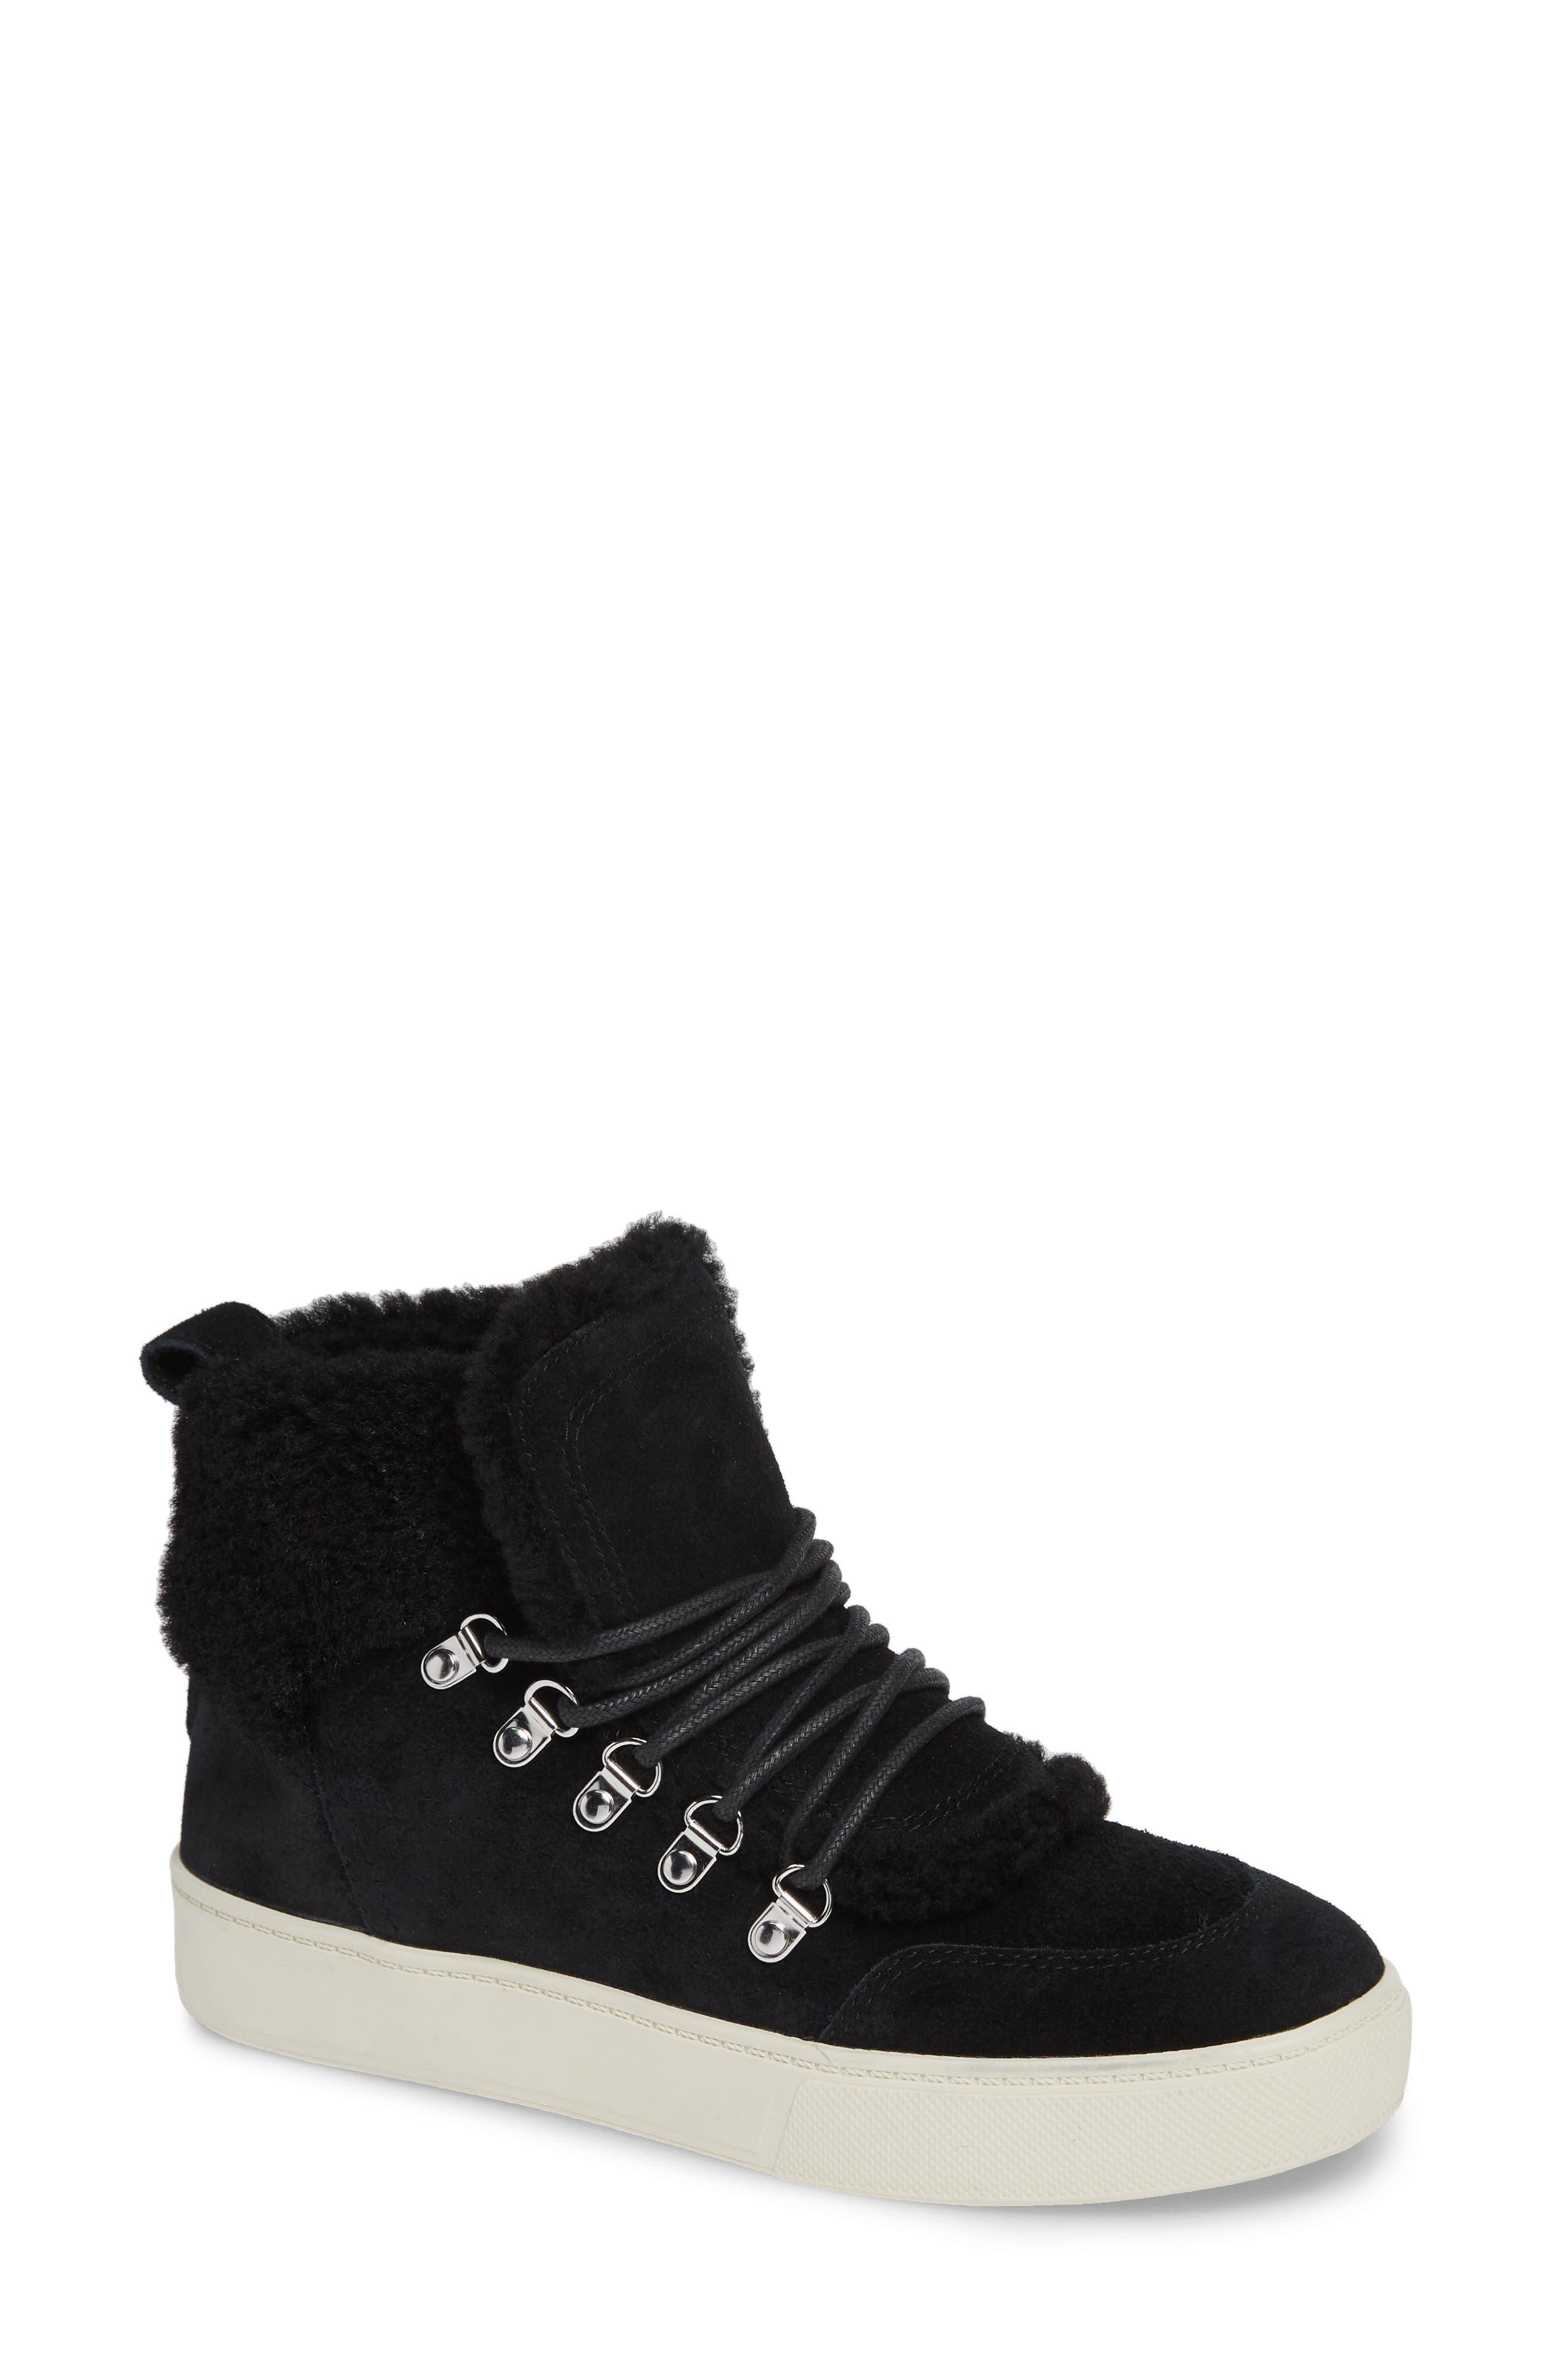 Marc Fisher LTD | Sana Sneaker